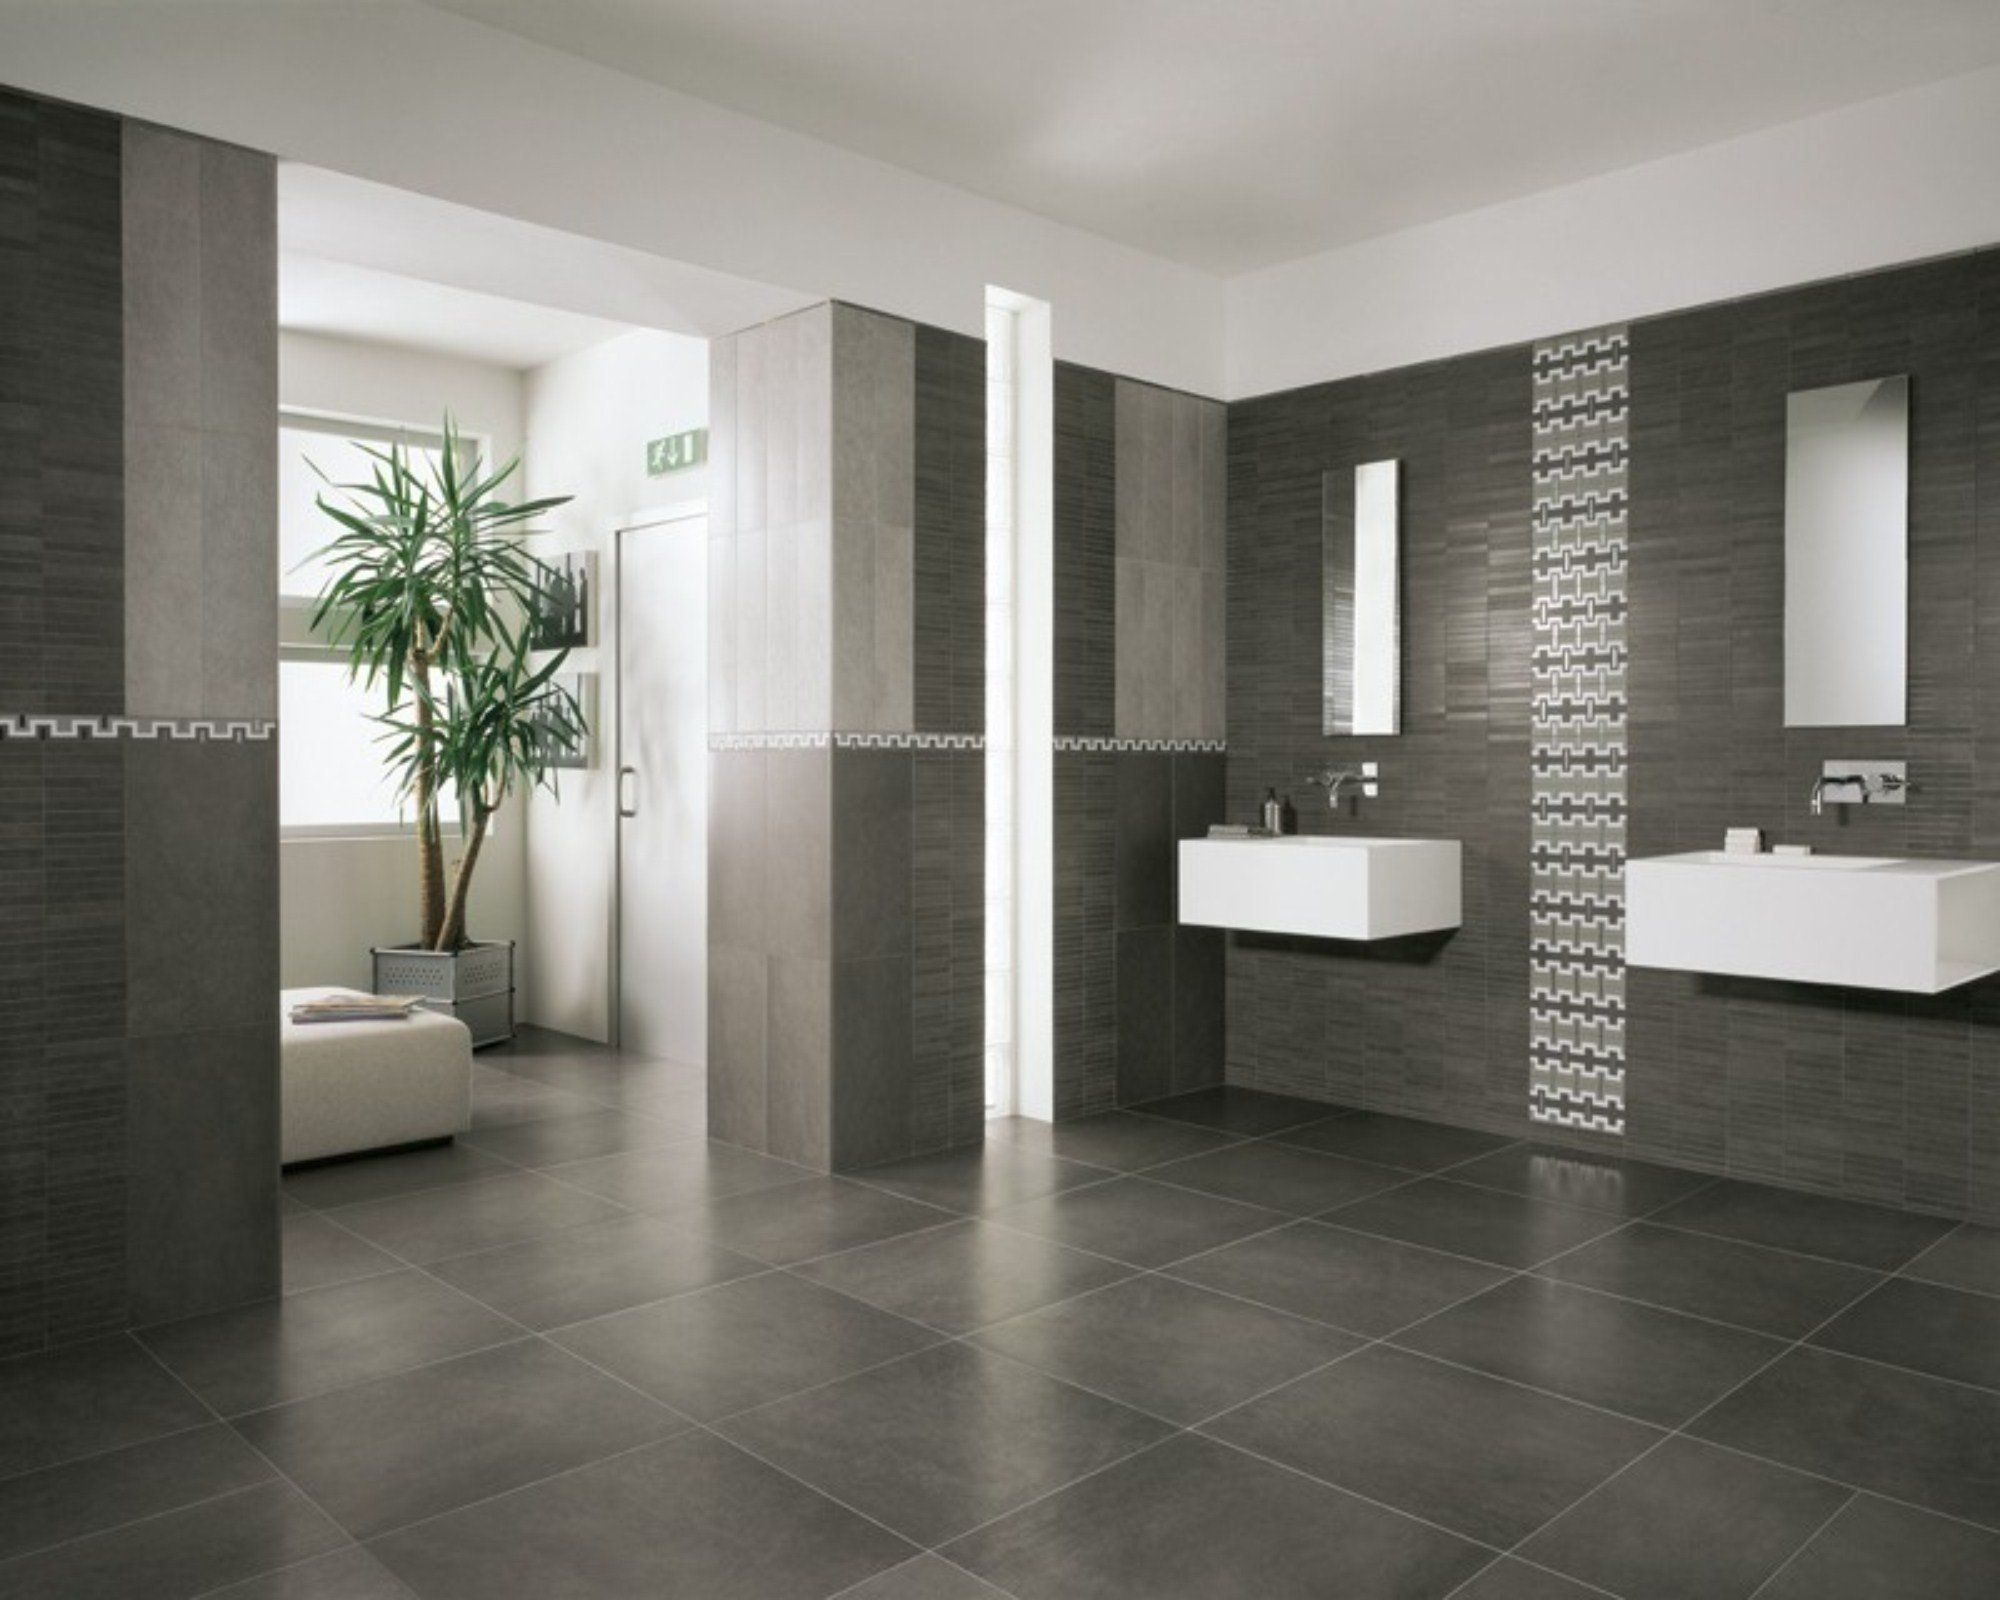 34 Luxury Ceramic Tiles Bathroom Decortez Modern Bathroom Tile Bathroom Wall Tile Design Bathroom Design Luxury